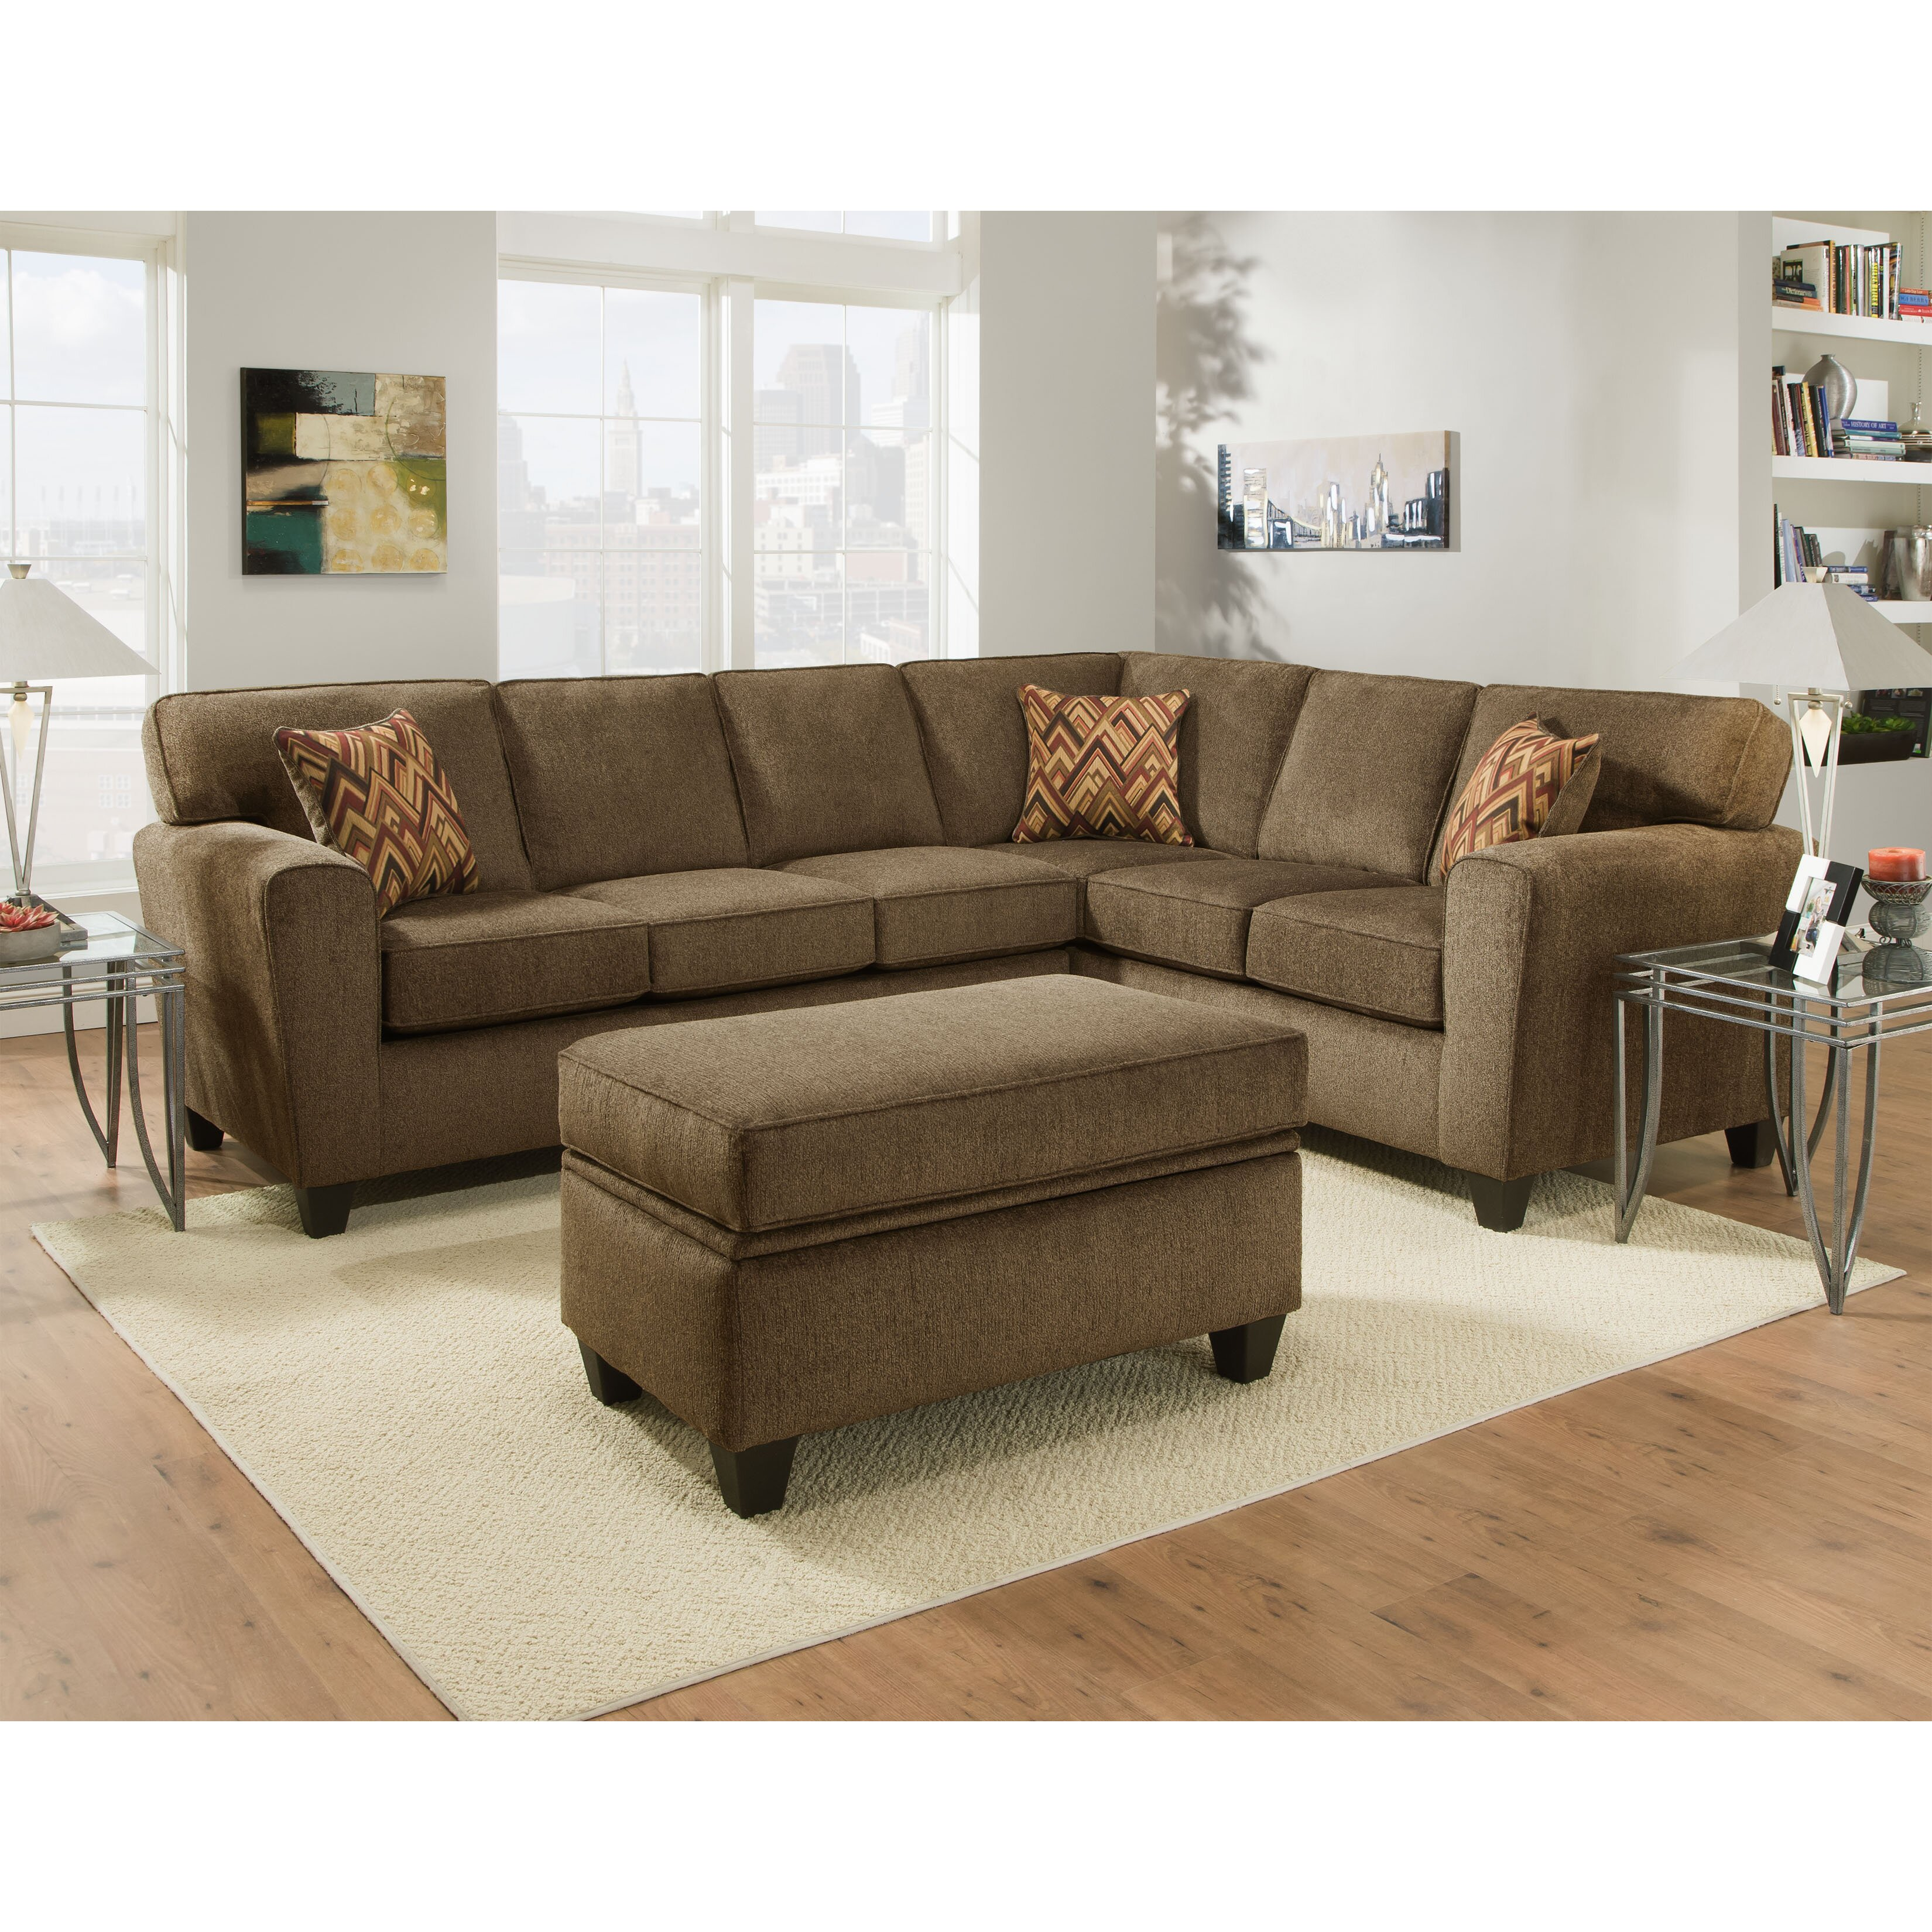 Brady Furniture Industries Pulaski Sectional